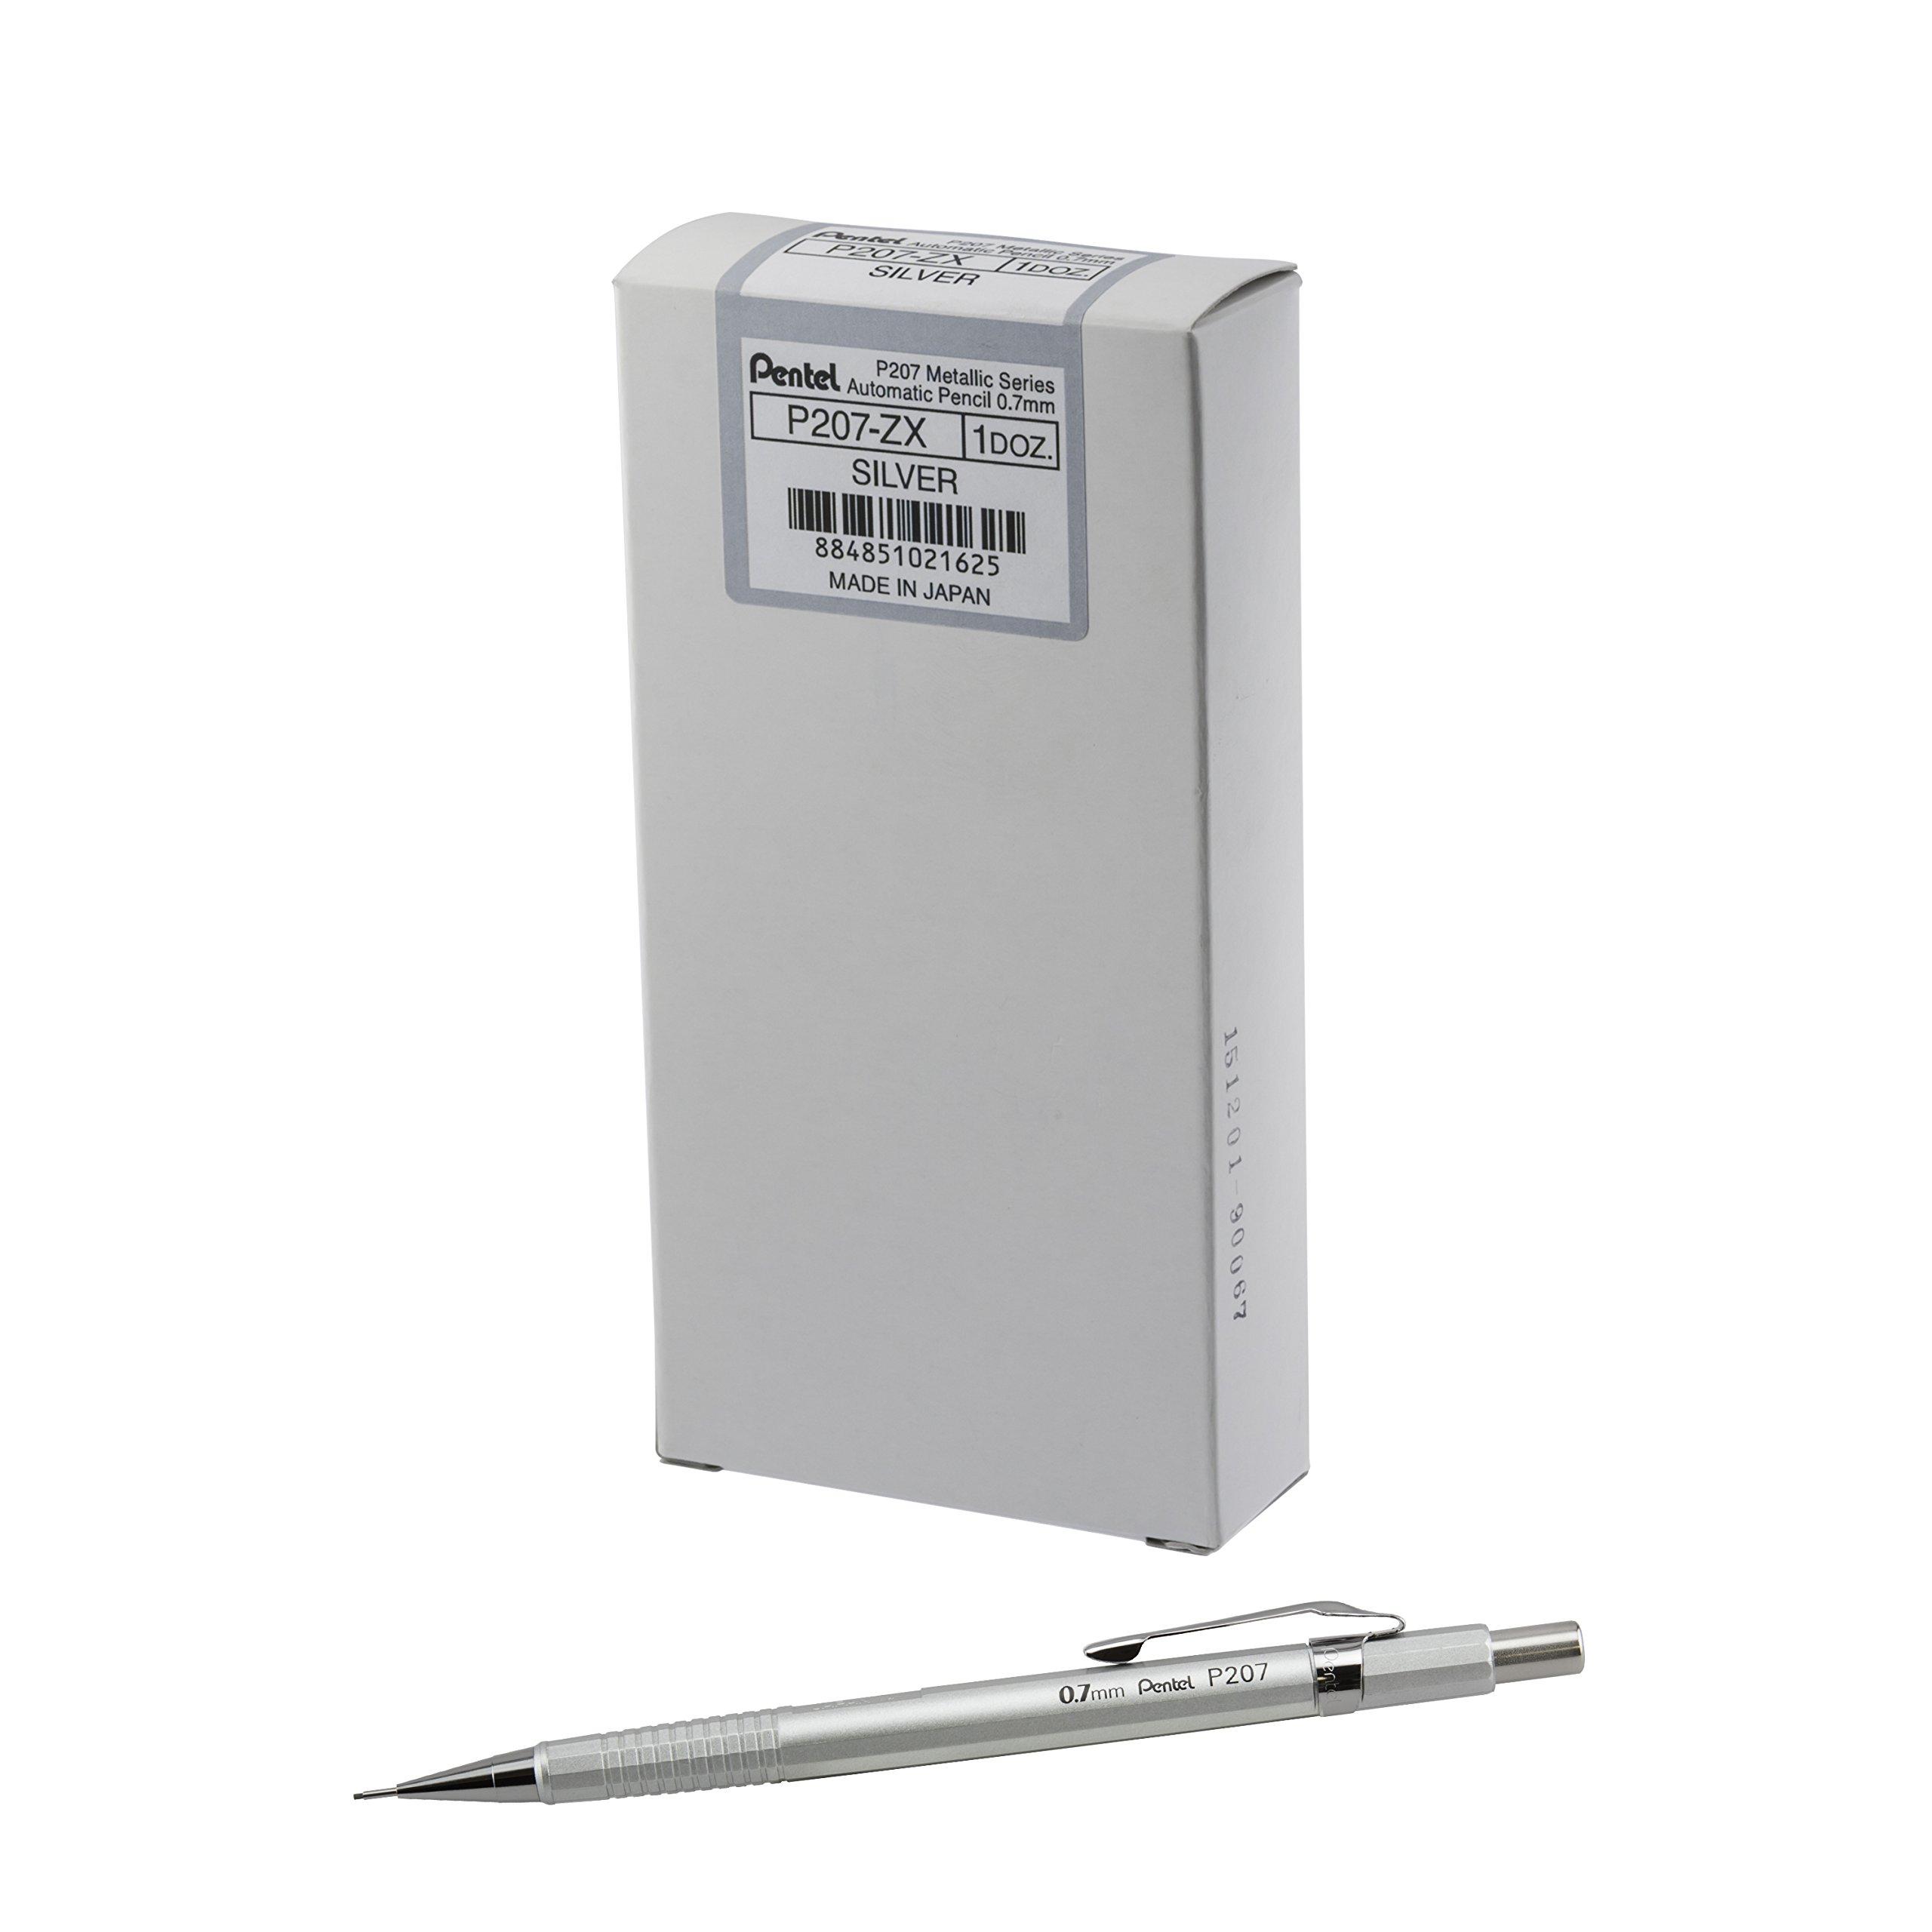 Pentel Sharp Mechanical Pencil (0.7mm) Metallic Silver Barrel, Box of 12 Pencils (P207Z) by Pentel